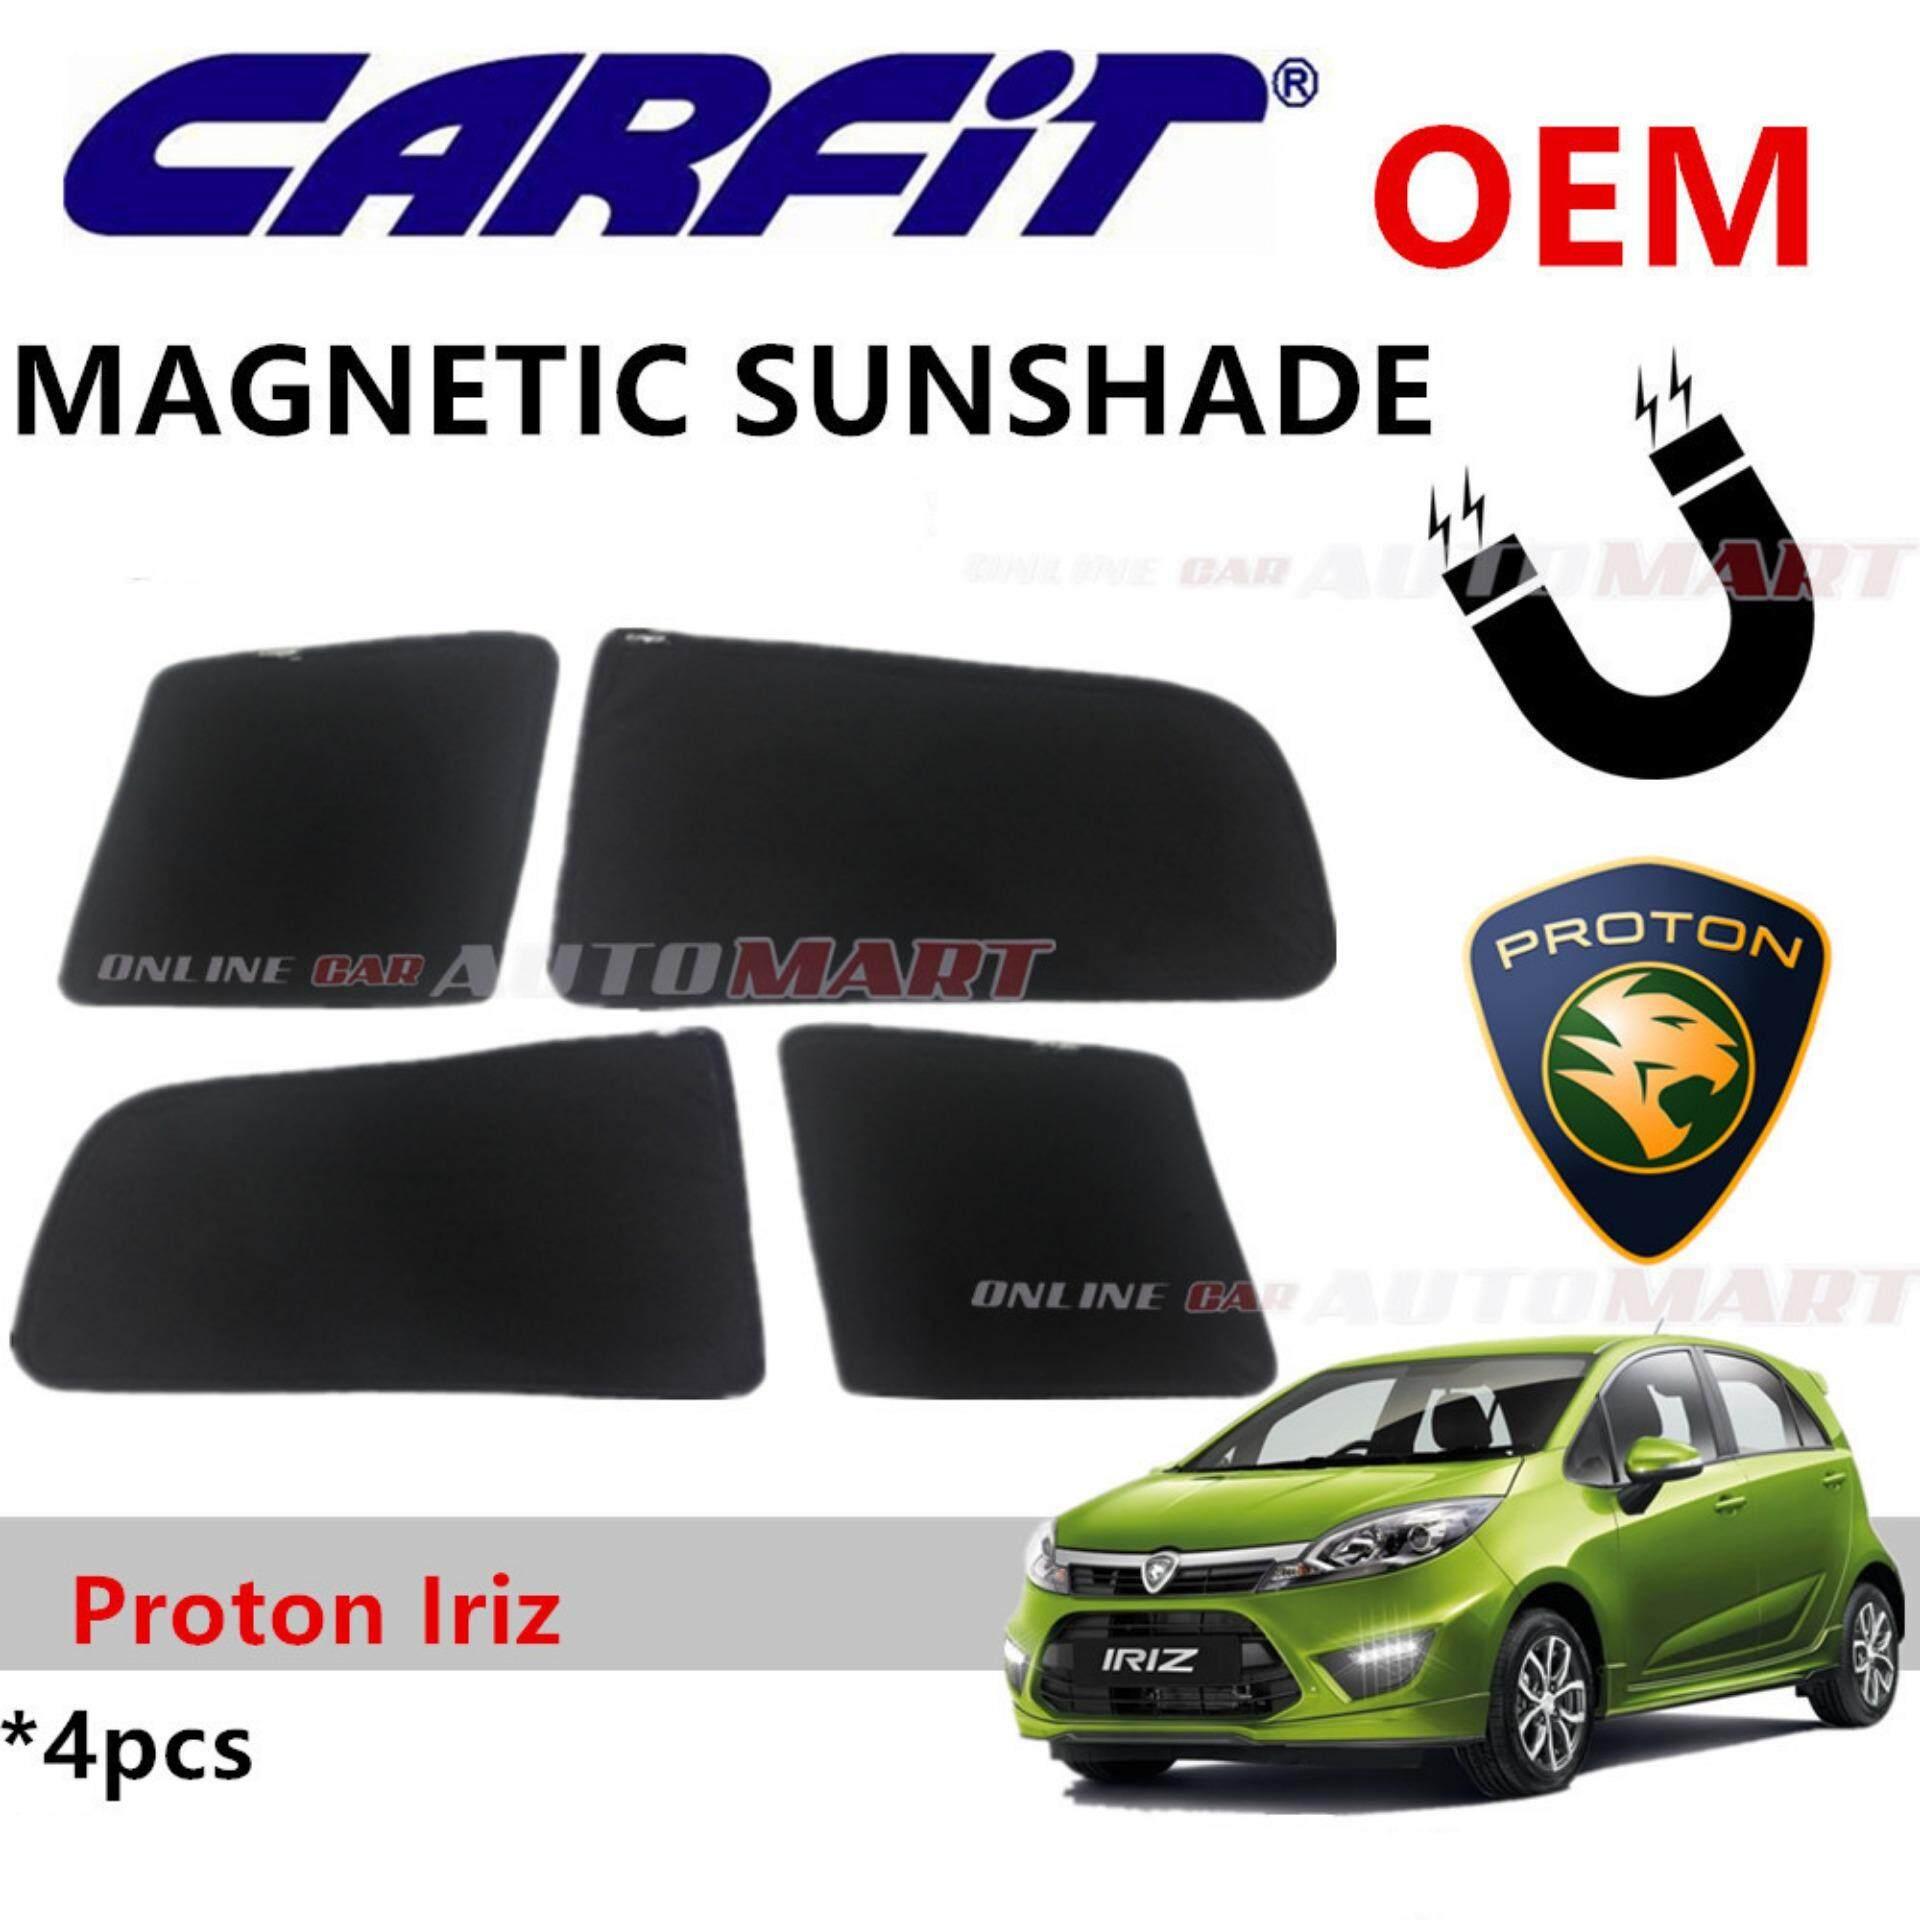 CARFIT OEM Magnetic Custom Fit Sunshade For Proton Iriz (4pcs Sets)